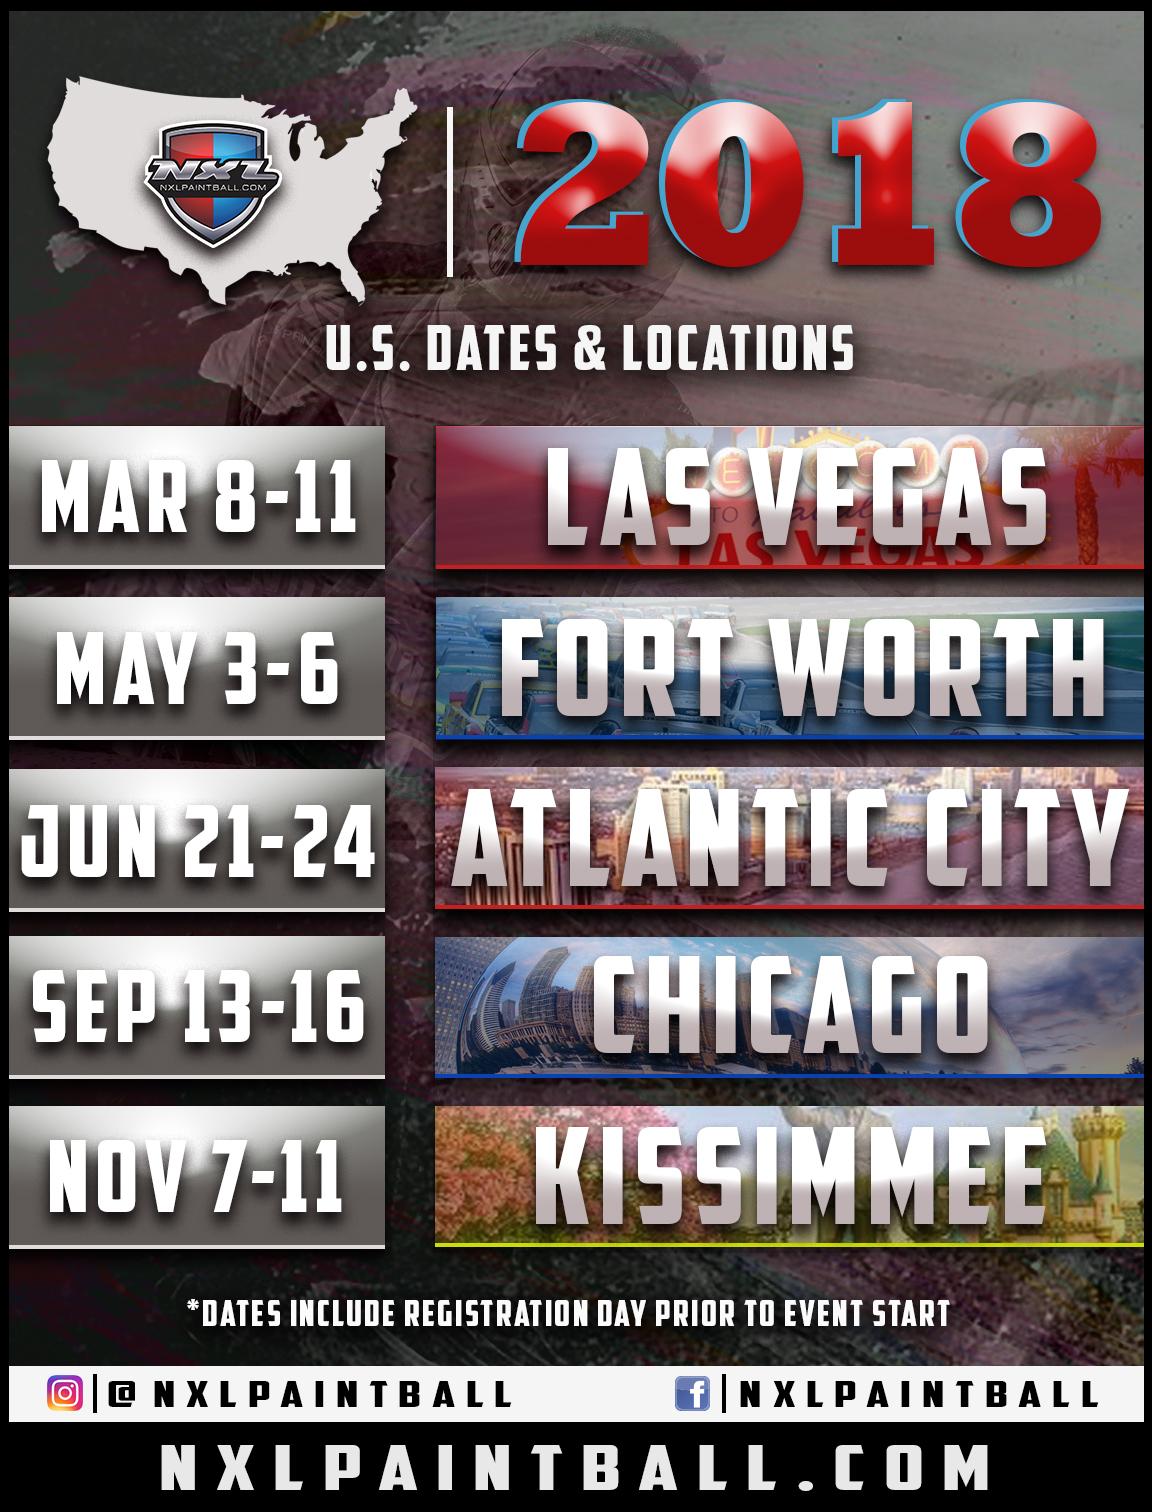 2018 nxl u s dates locations nxlpaintball com tournament